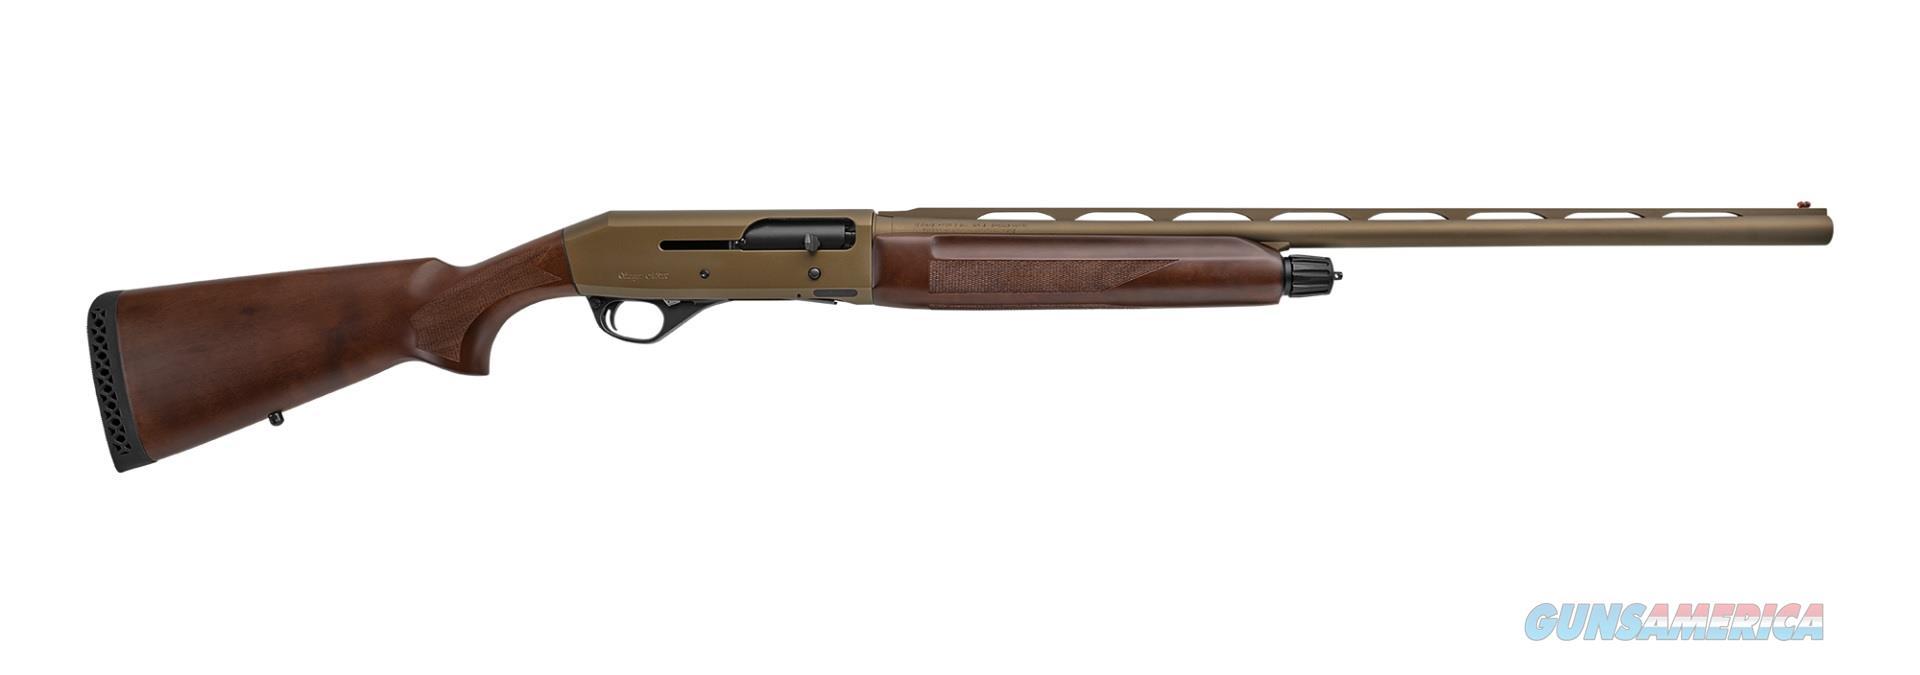 "Stoeger M3000 12 Gauge 28"" Walnut / Burnt Bronze 31930  Guns > Shotguns > Stoeger Shotguns"